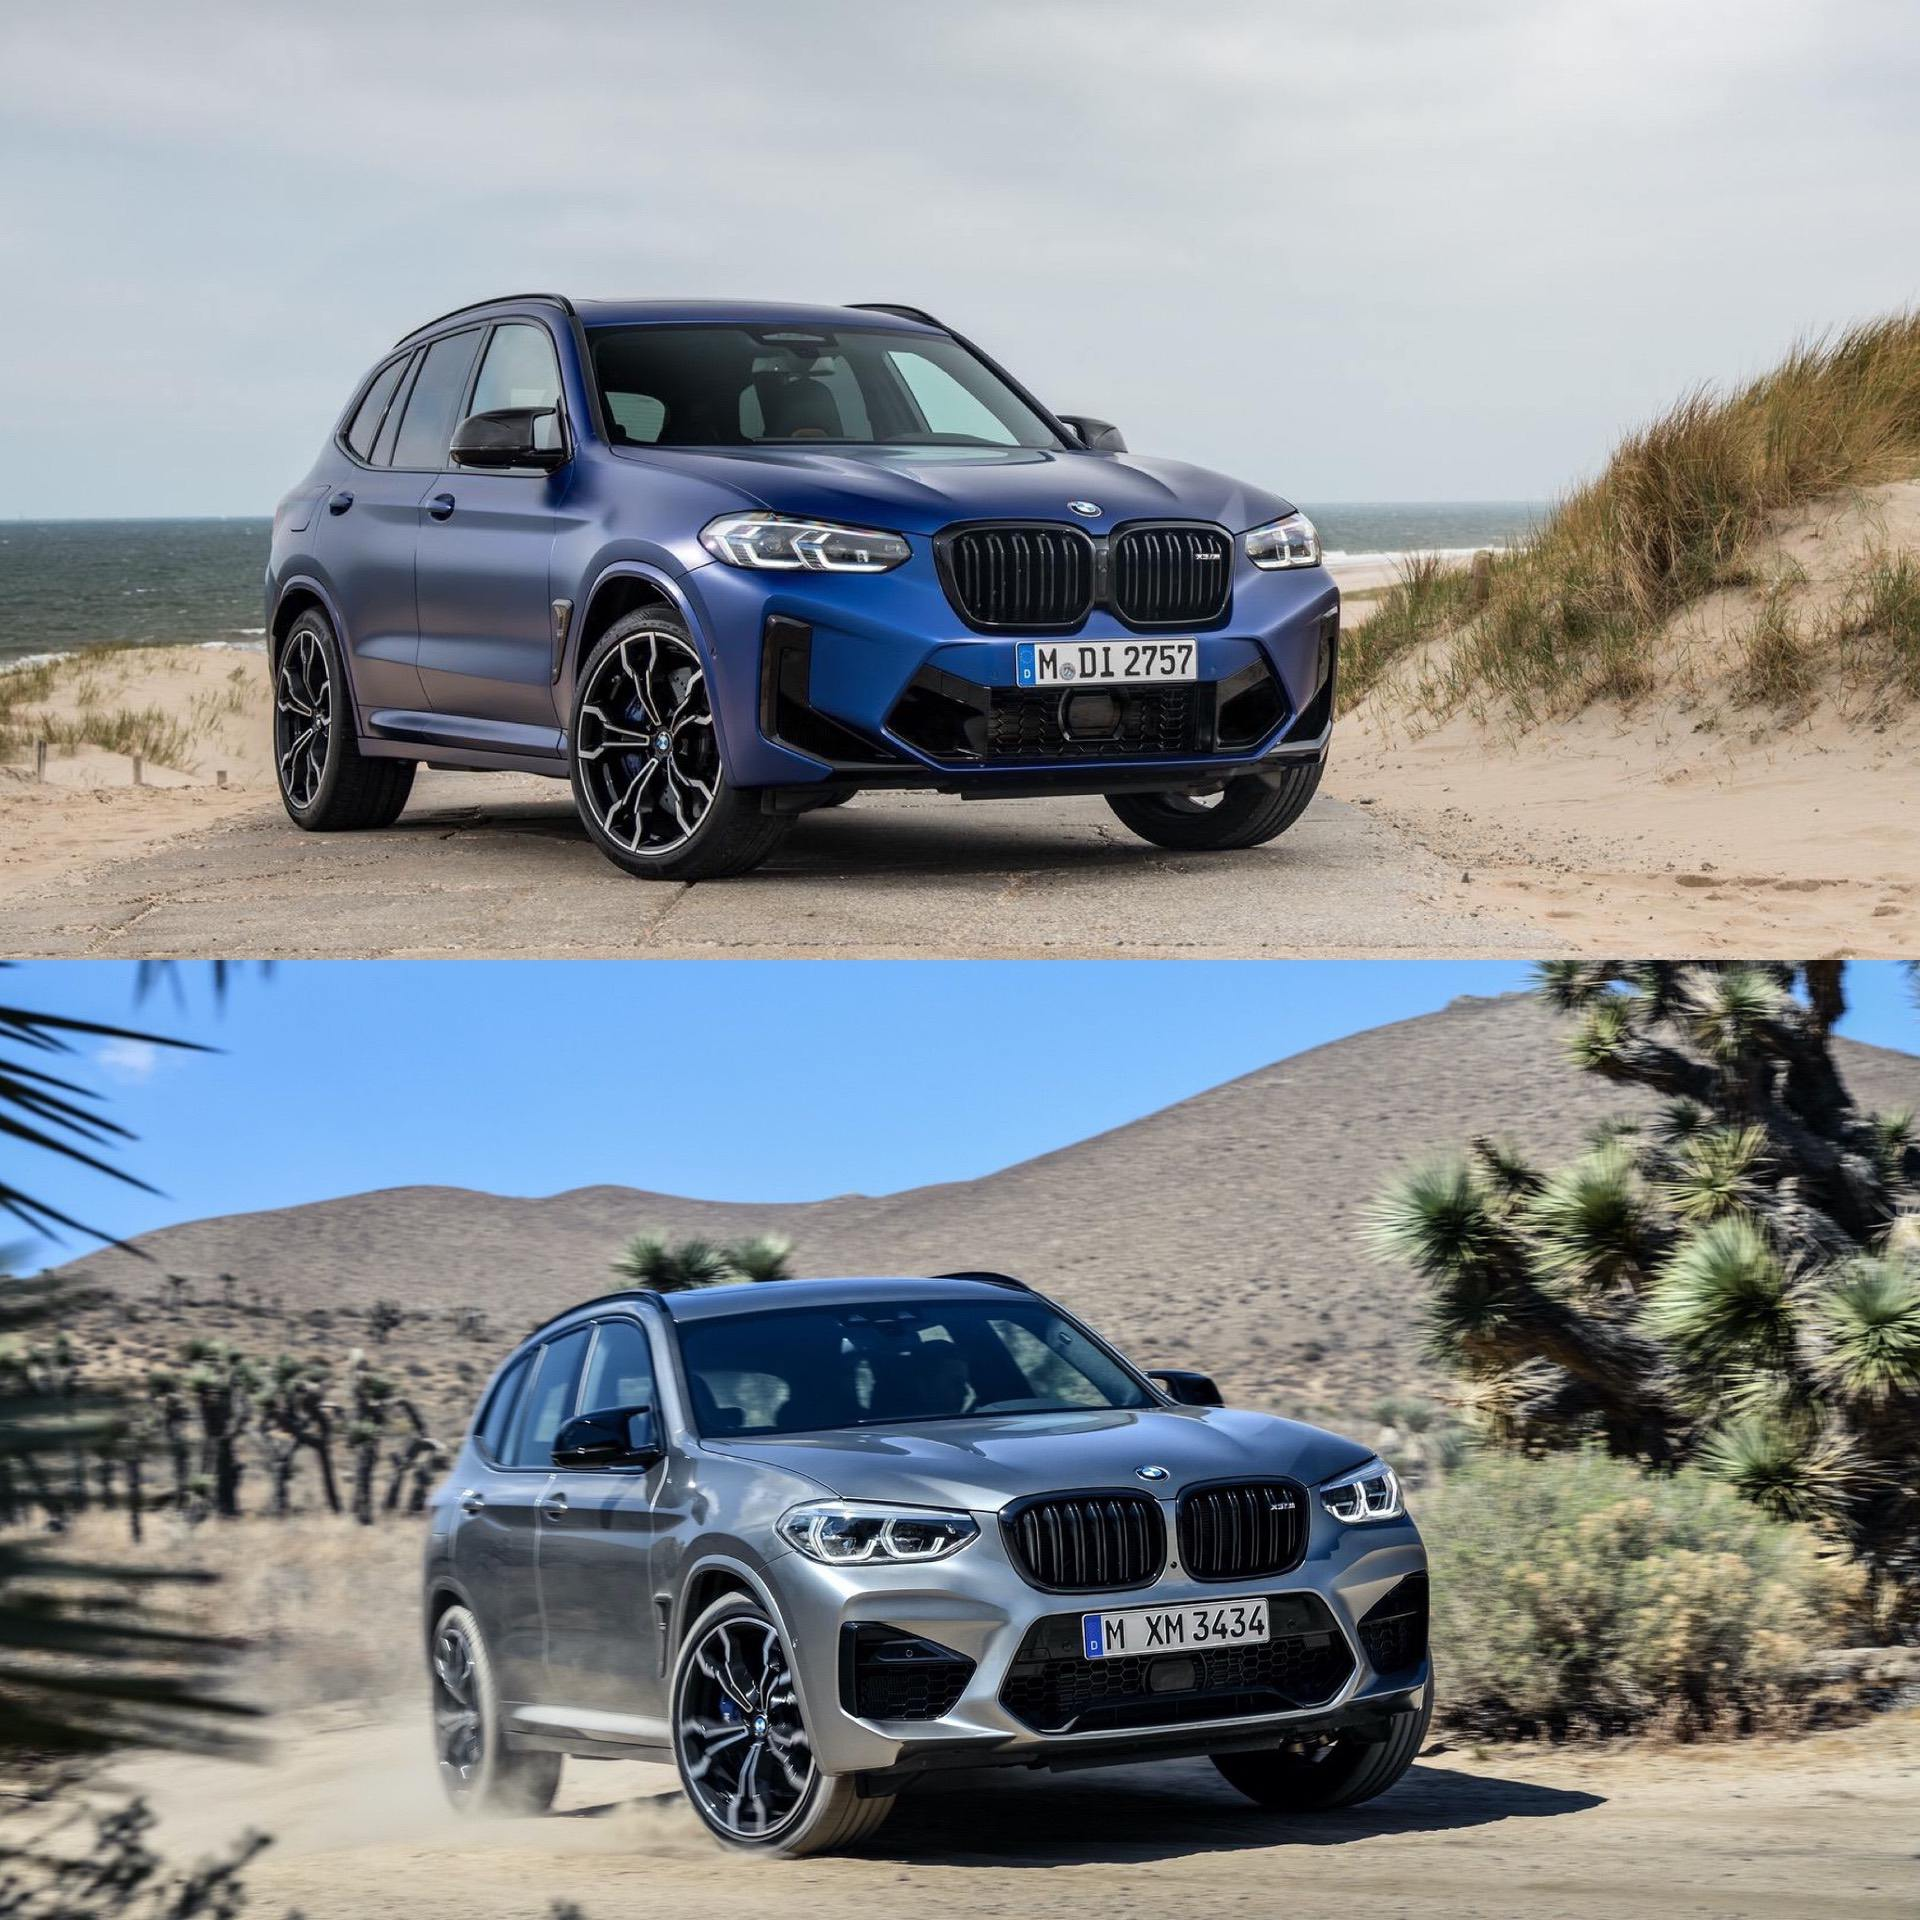 bmw x3m facelift vs no lci 04